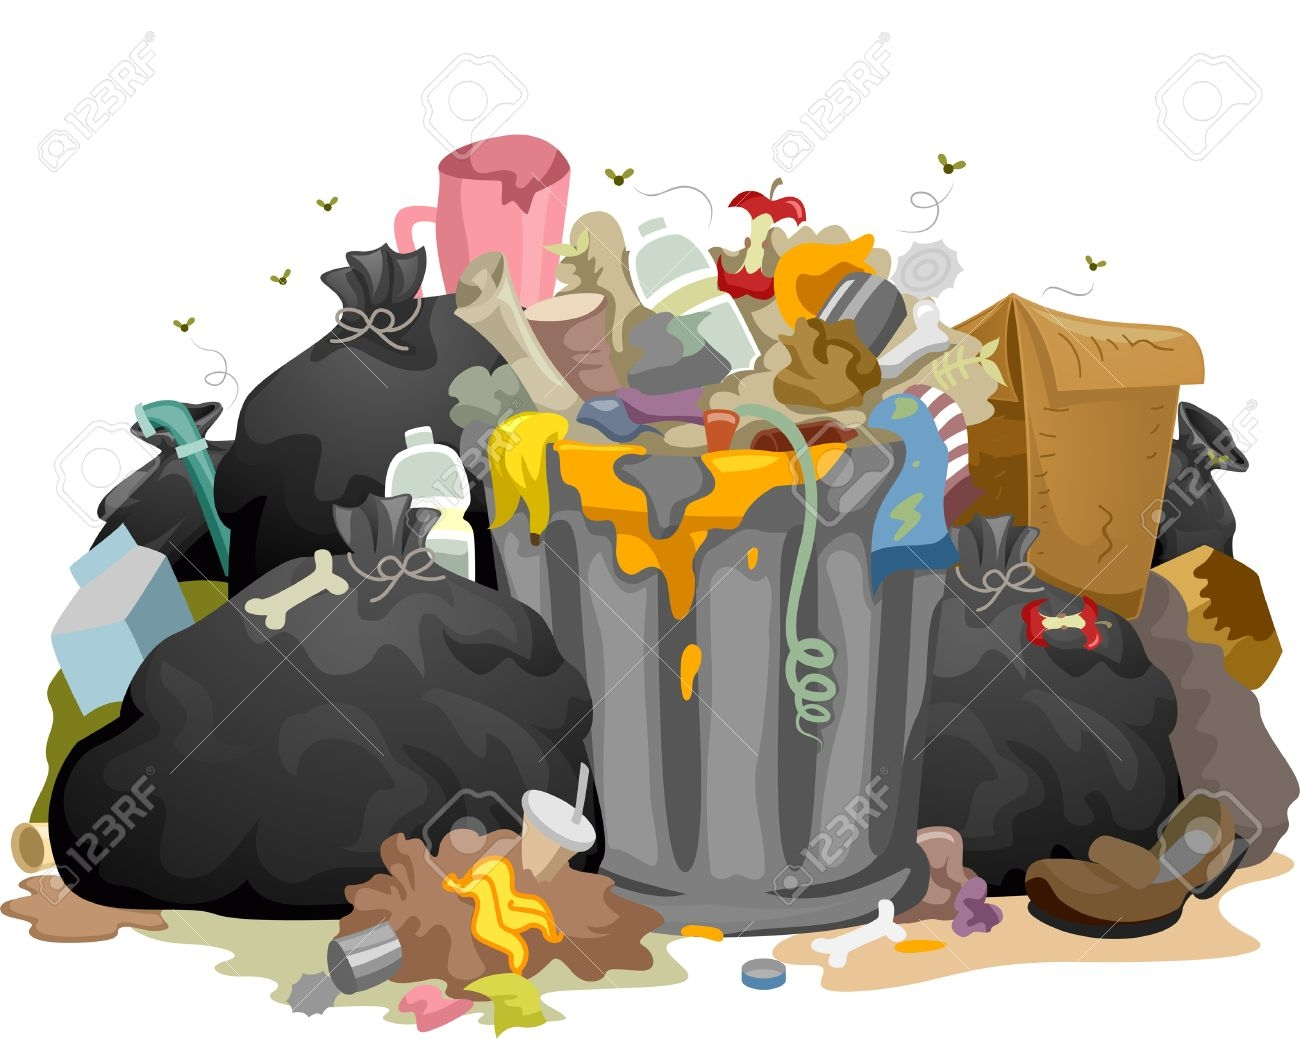 Garbage clipart. Fresh design digital collection